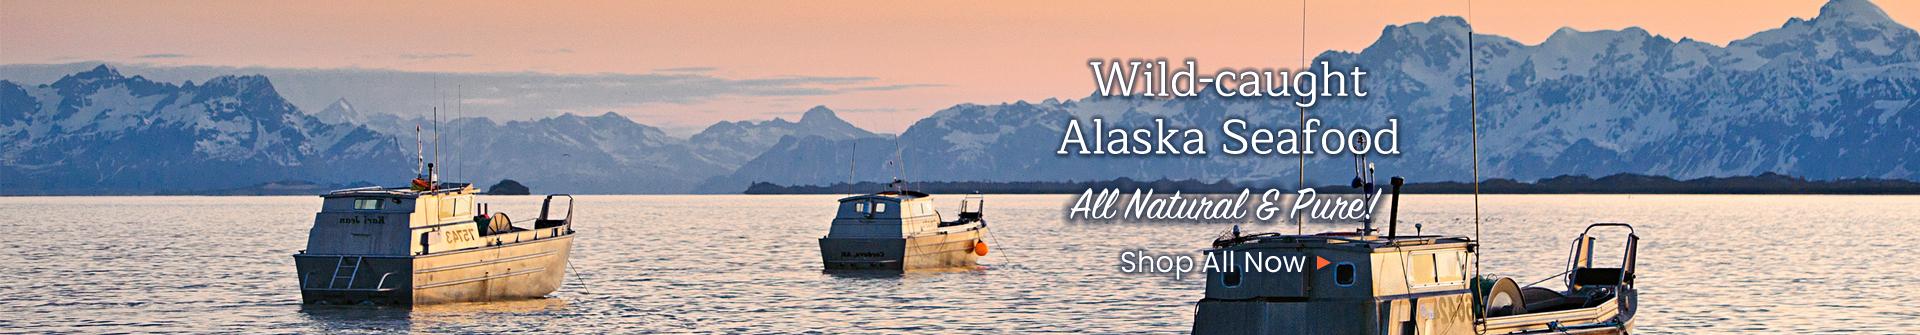 Wild-caught Alaska Seafood